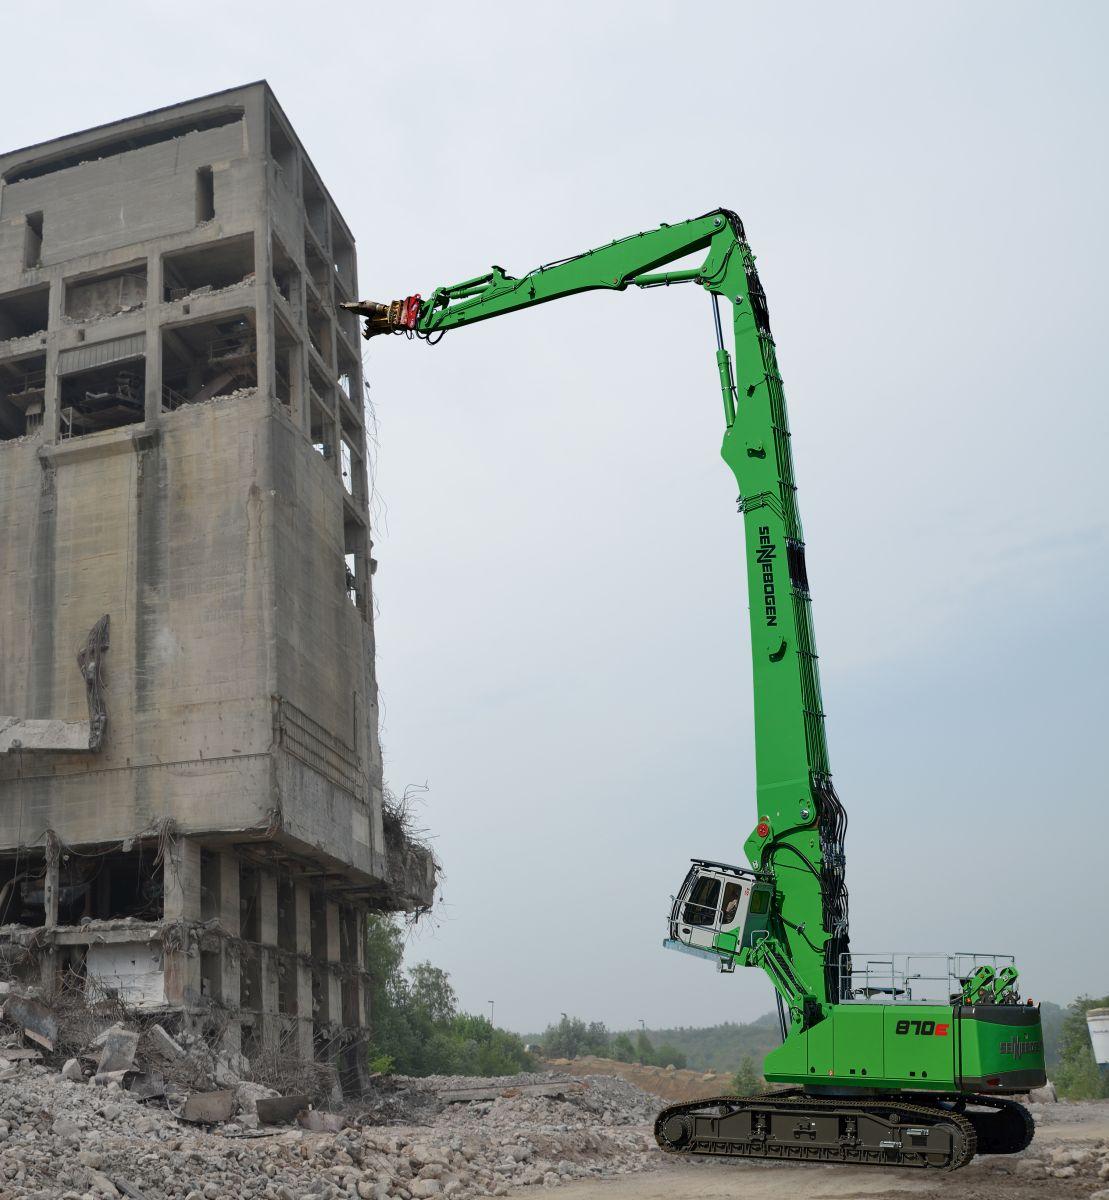 Sennebogen Longfront-Abbruchbagger 870 E